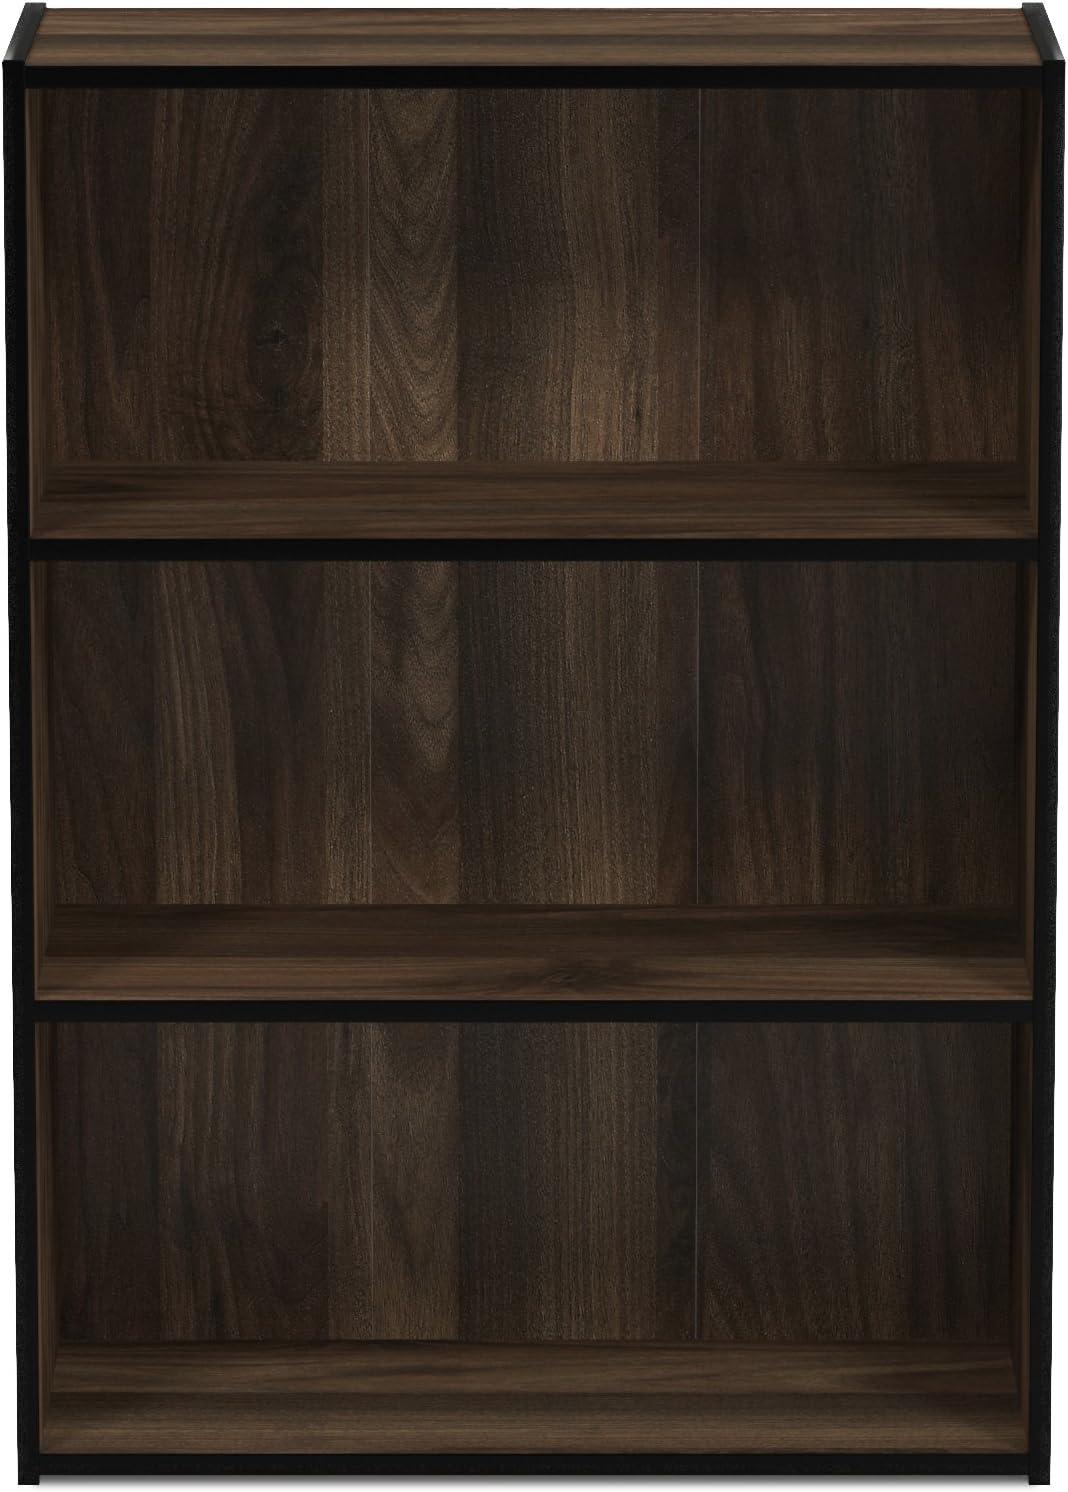 Furinno Pasir 3-Tier Open Shelf Bookcase, Columbia Walnut